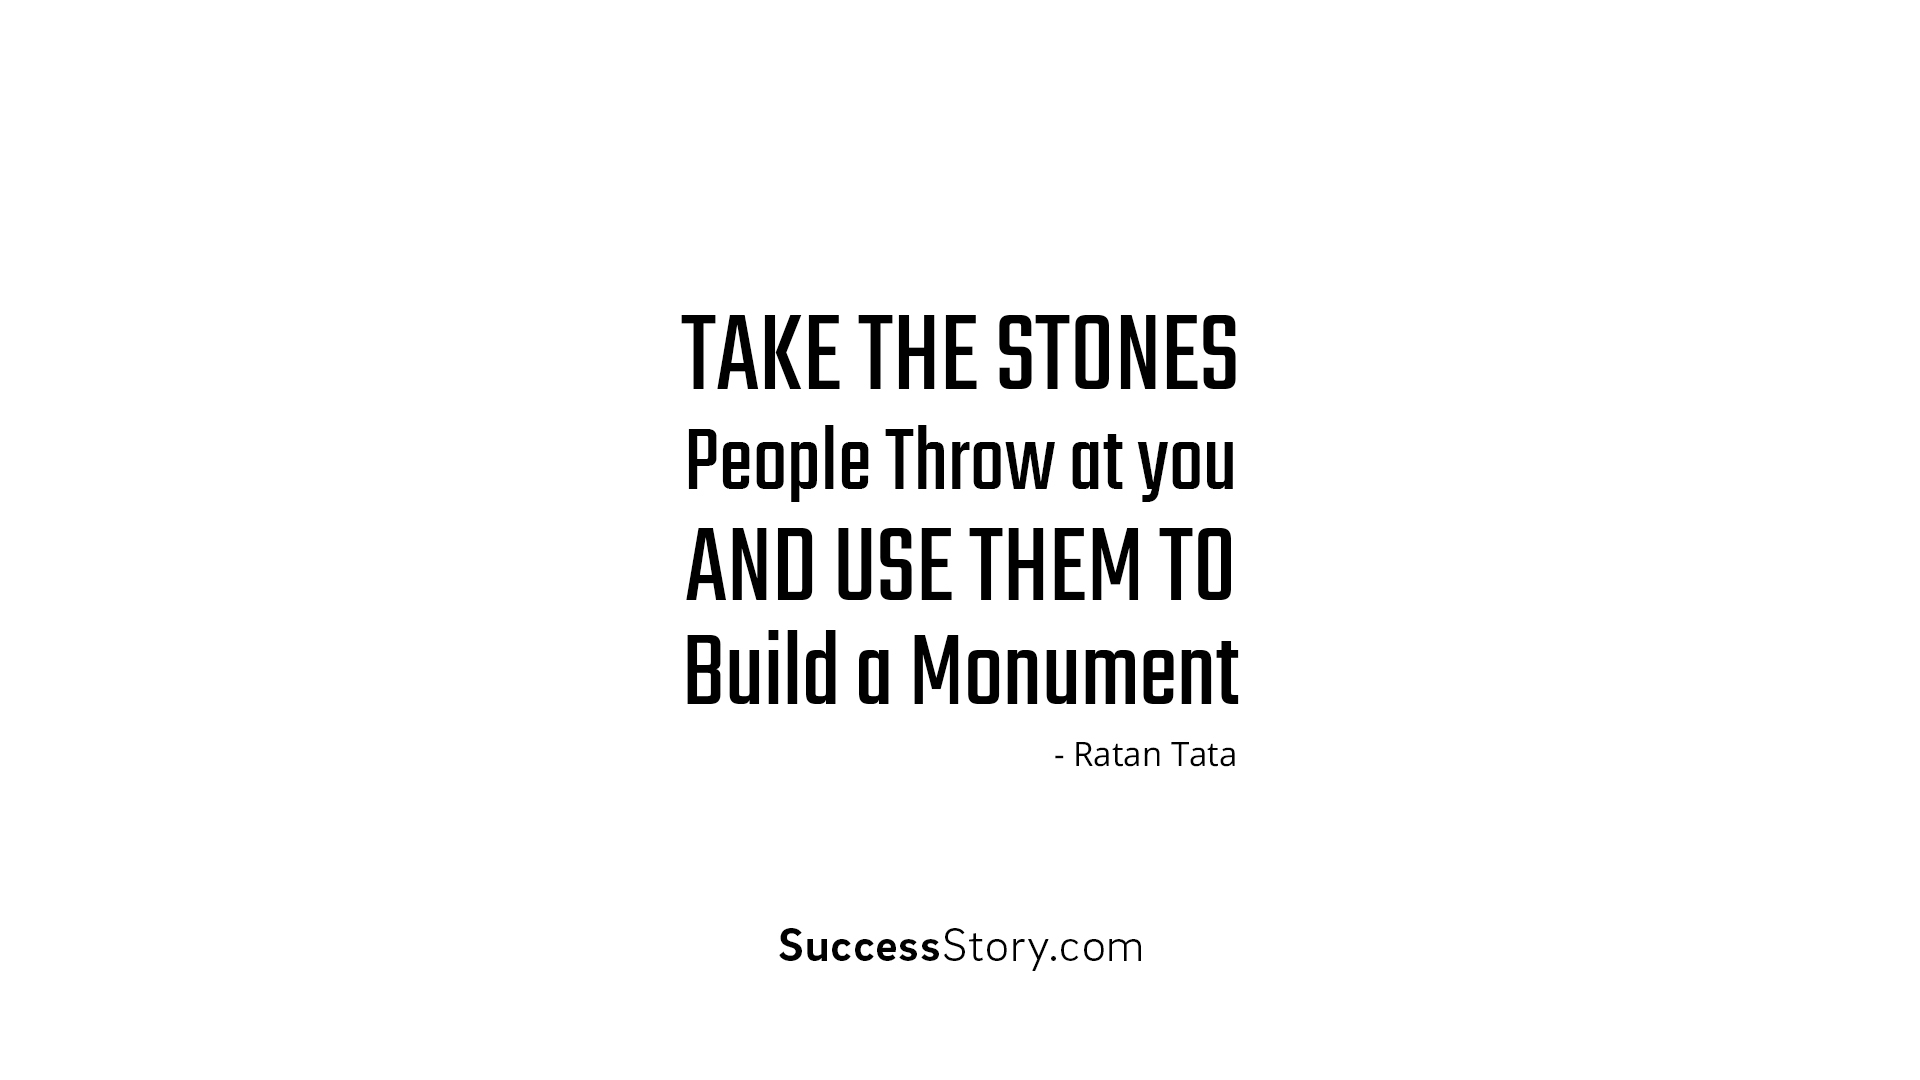 Take the stone